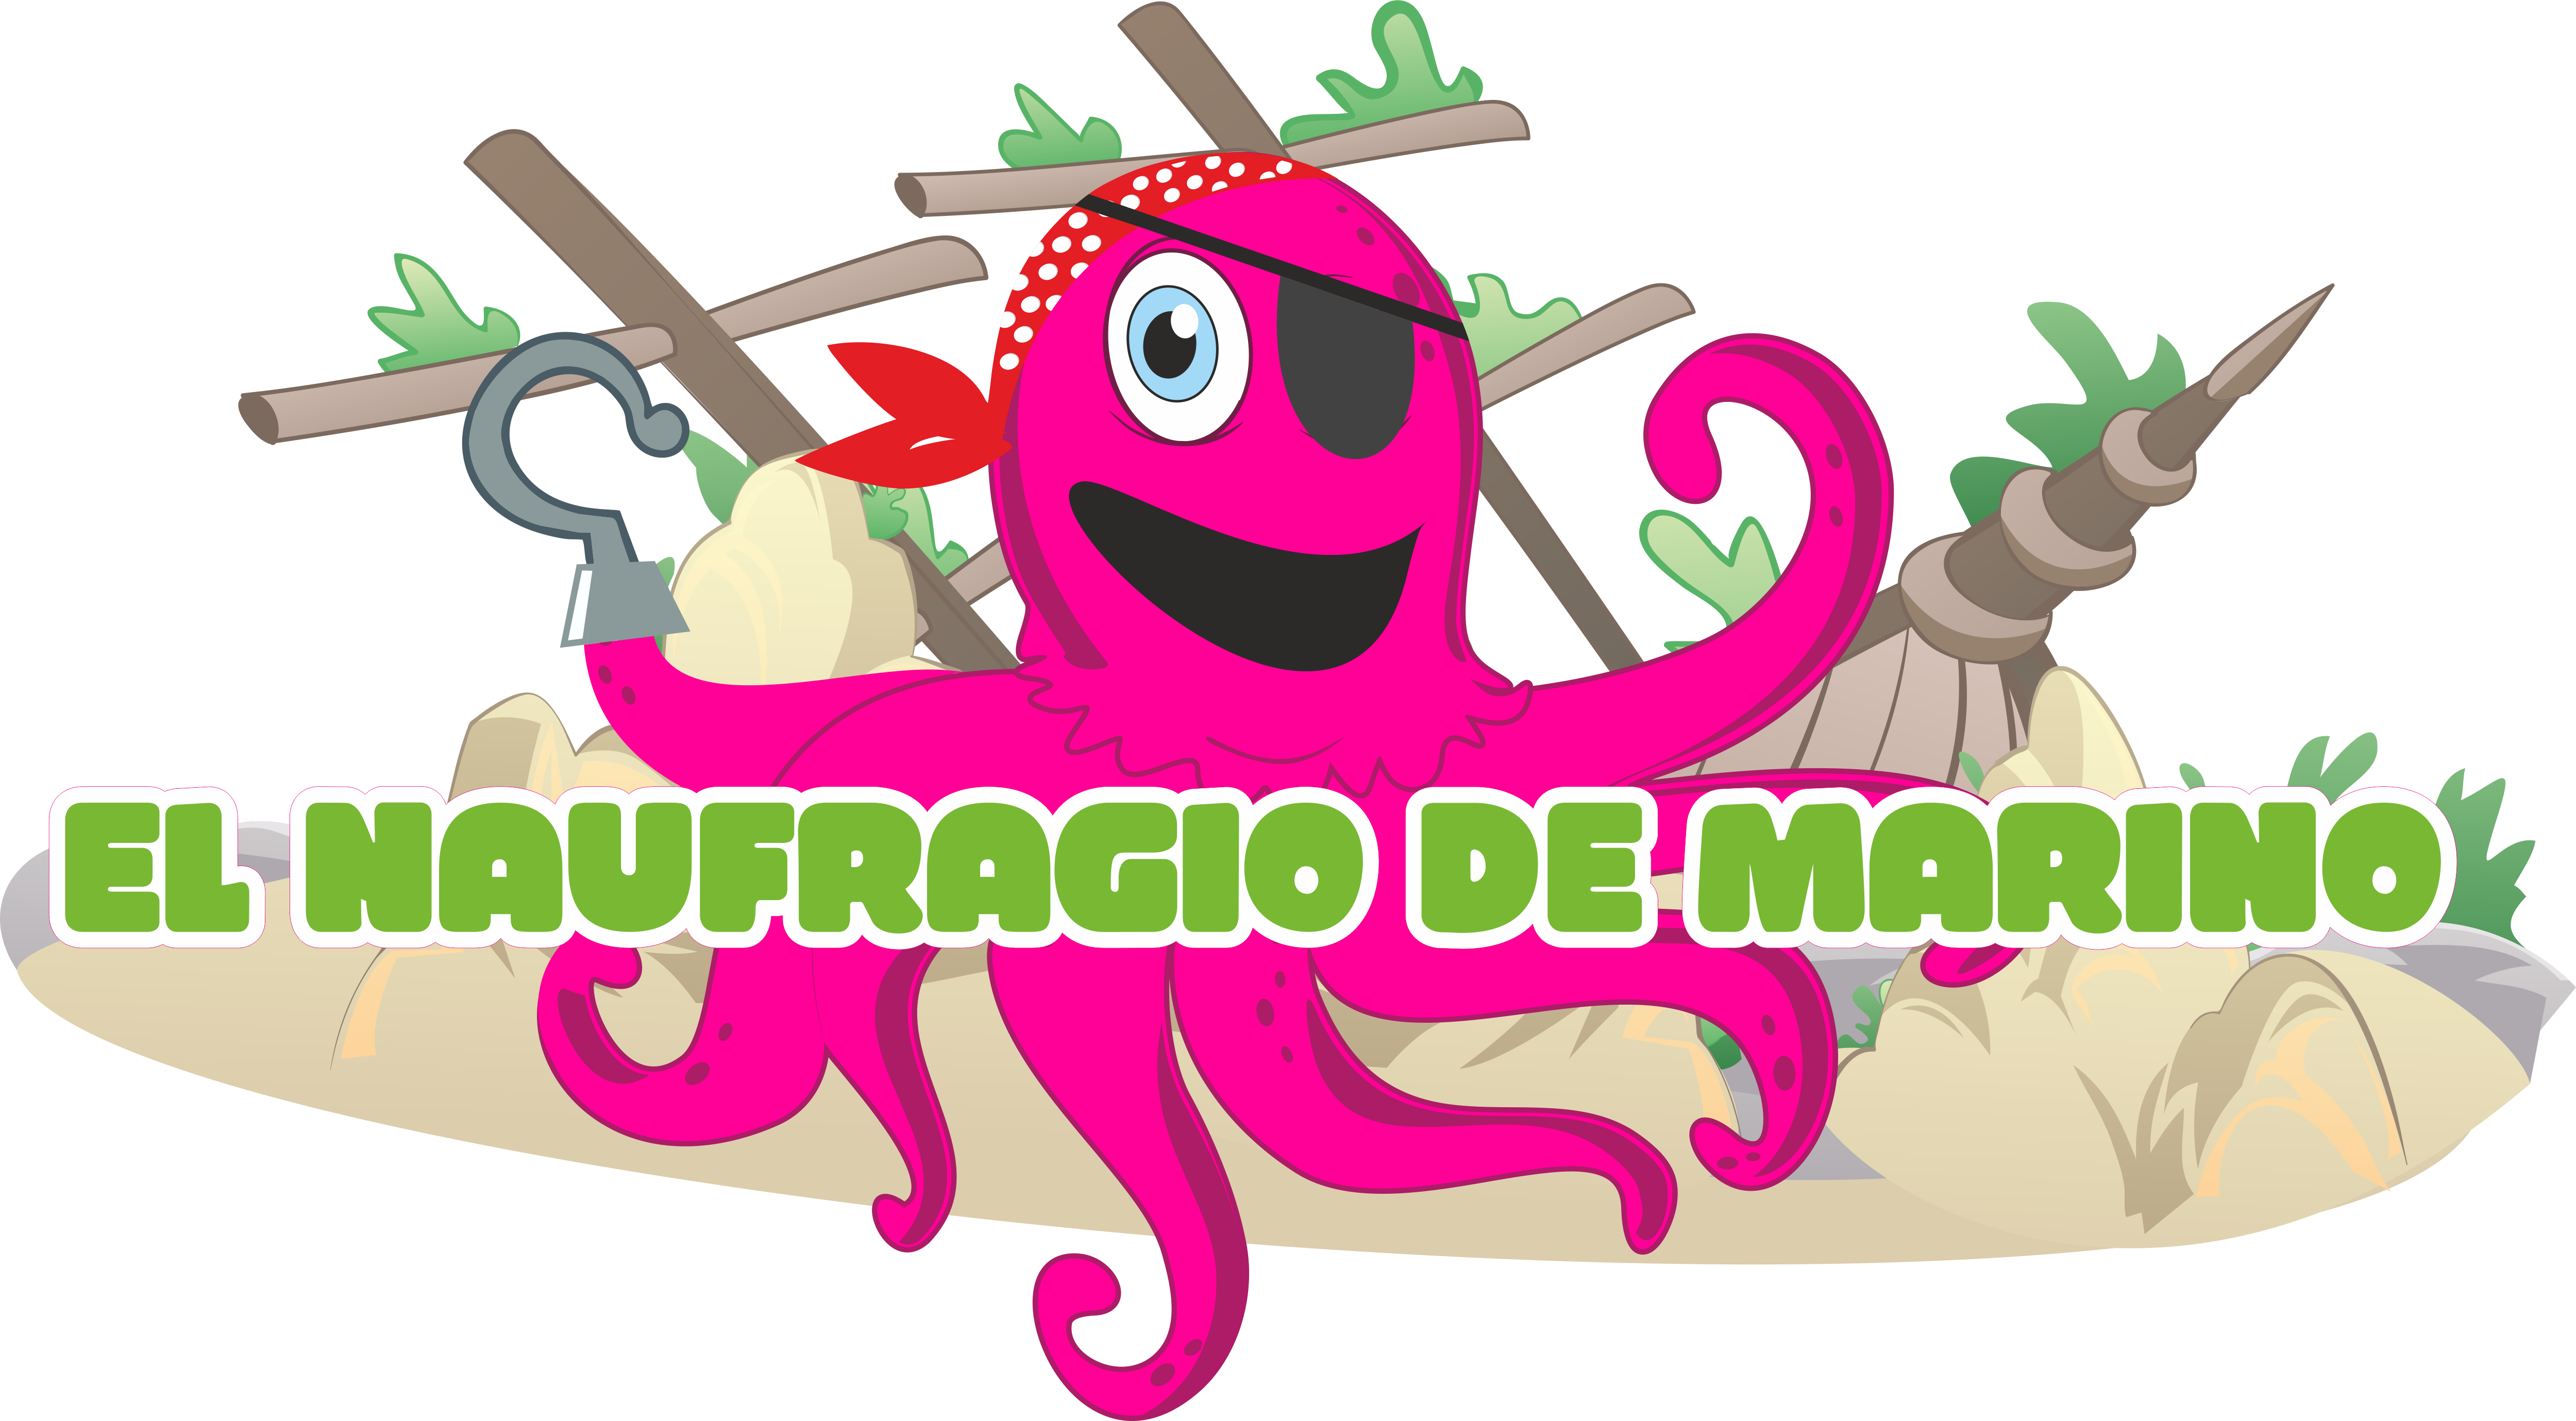 naufragio_marino